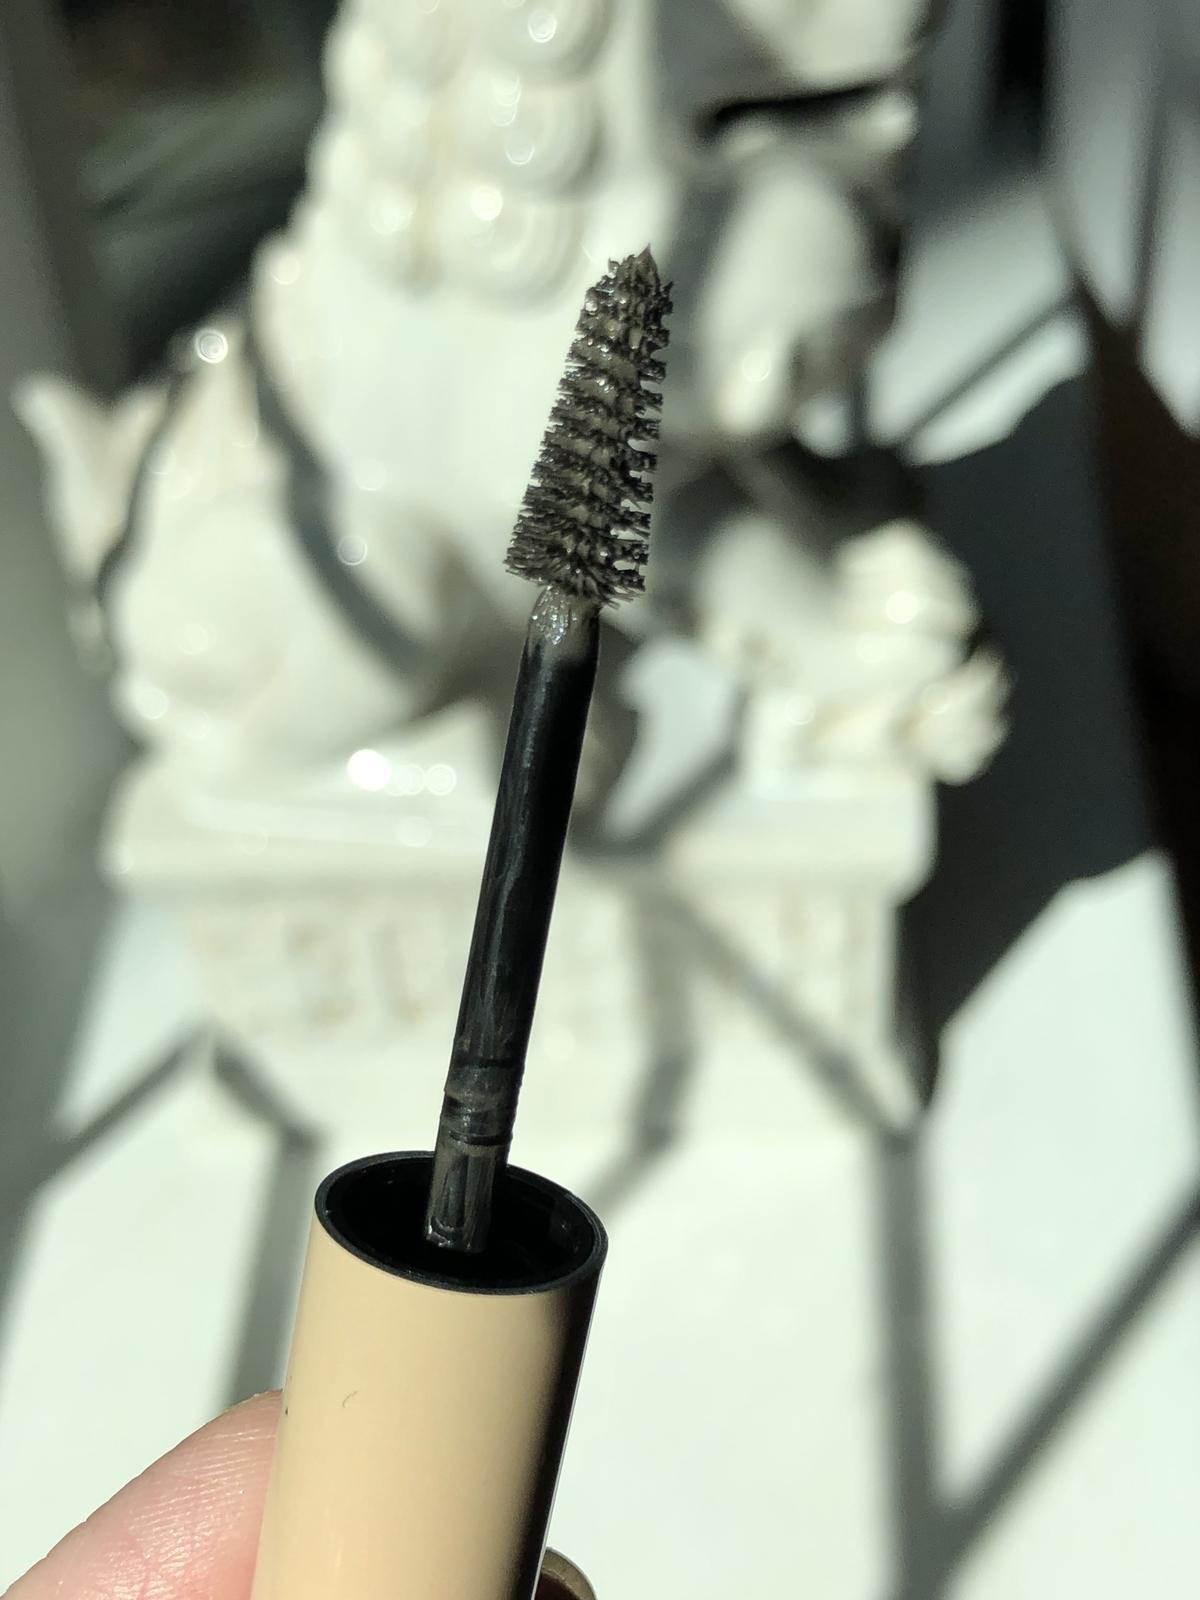 Persona Cosmetics Swipe Up Brow Gel, close-up of brush